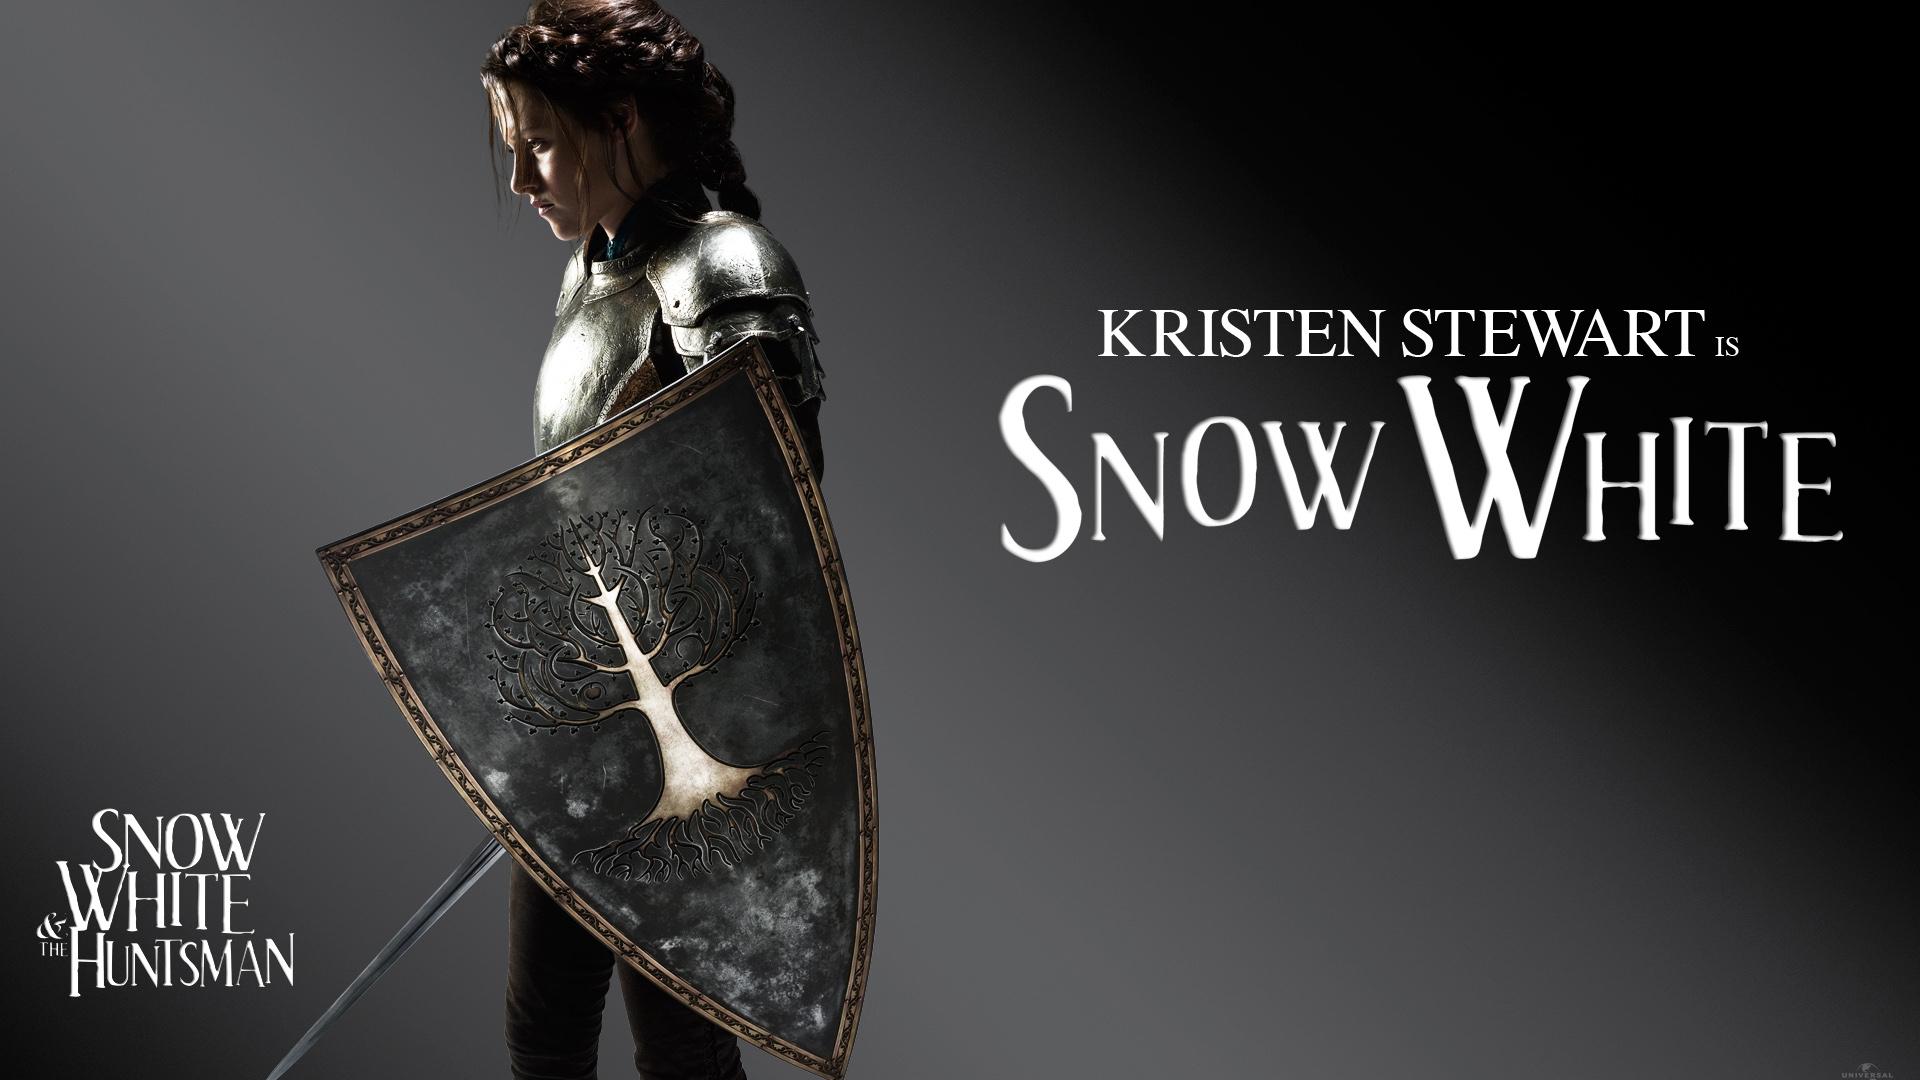 http://4.bp.blogspot.com/-JZvIxY1_K9w/UFWI6ydILYI/AAAAAAAAJ2U/ekyU7c0L2yk/s0/snow-white-2012-1920x1080-wallpaper.jpg